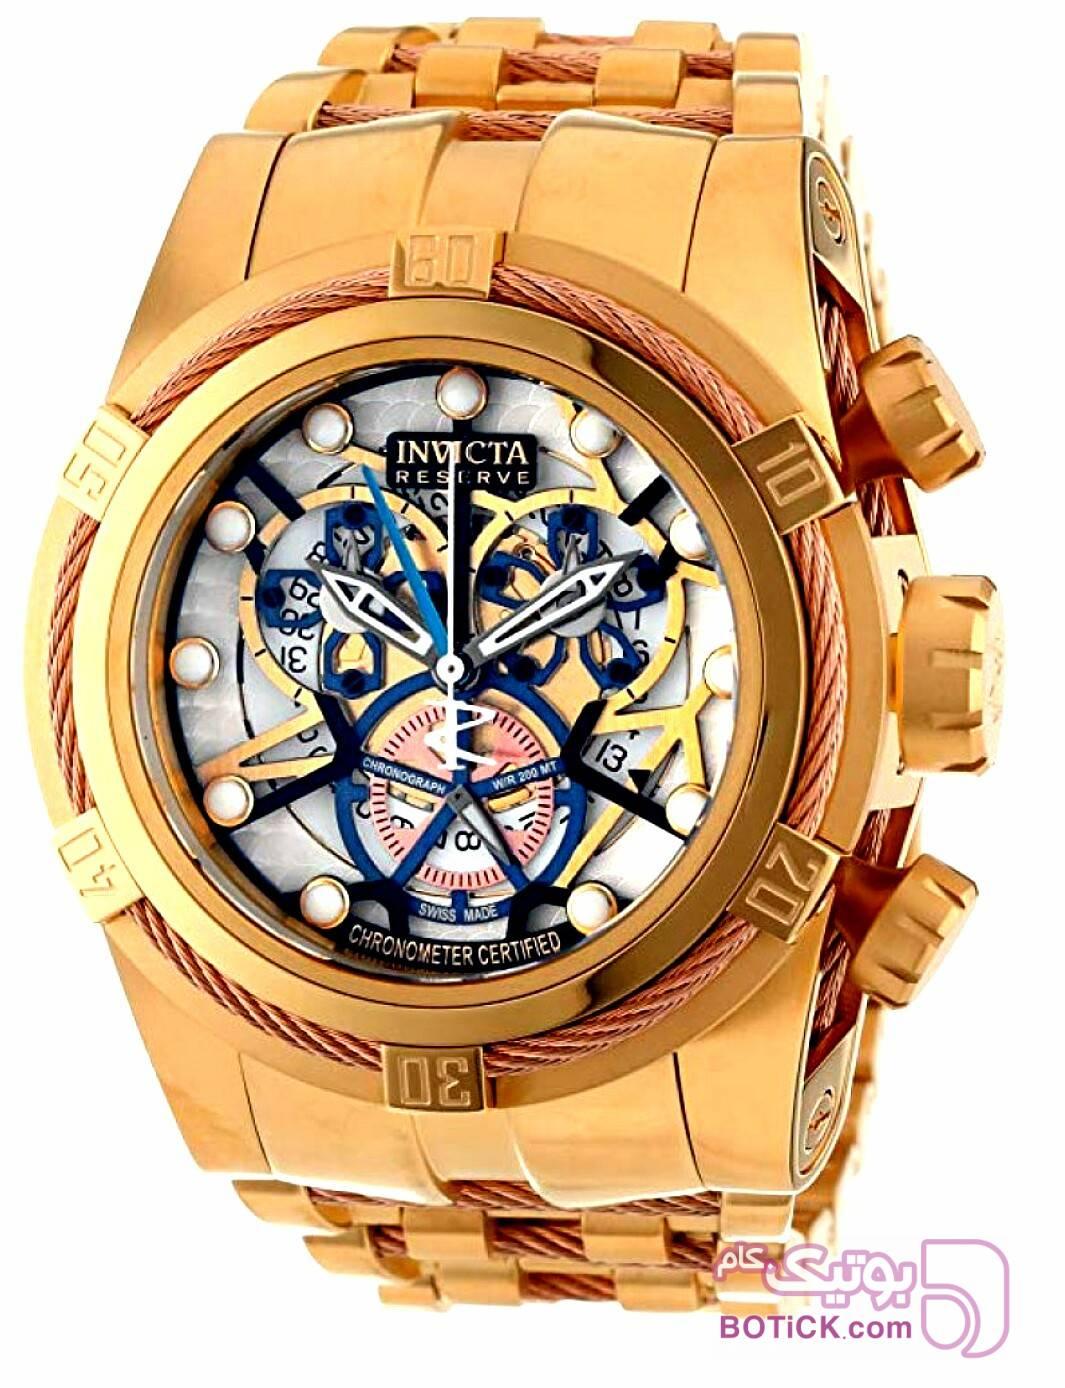 ساعت سوئیسی 300 دلاری اینویکتا زرد ساعت